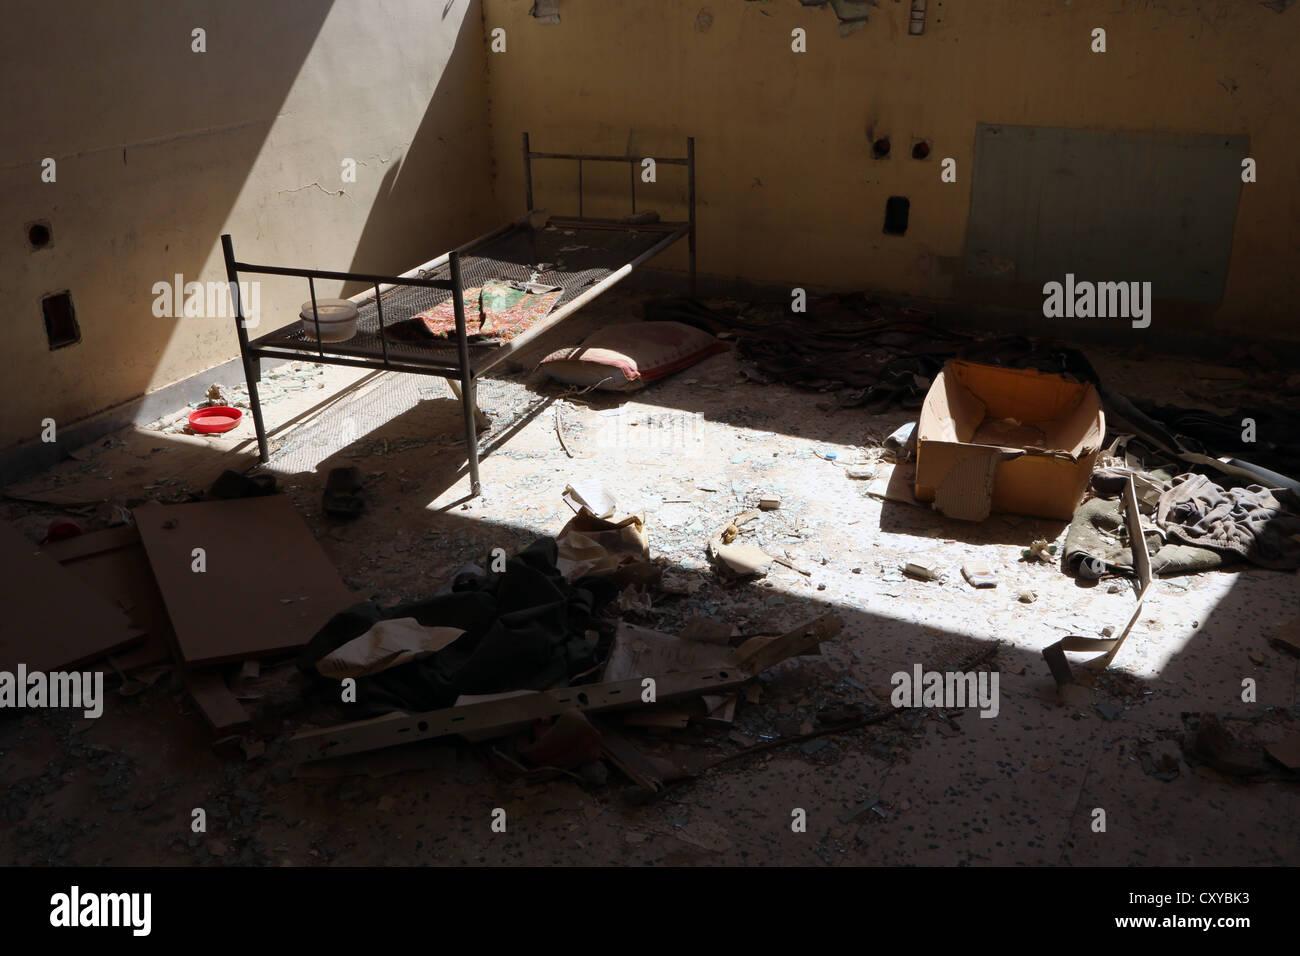 Abu Salim prison, Tripoli, Libya - Stock Image